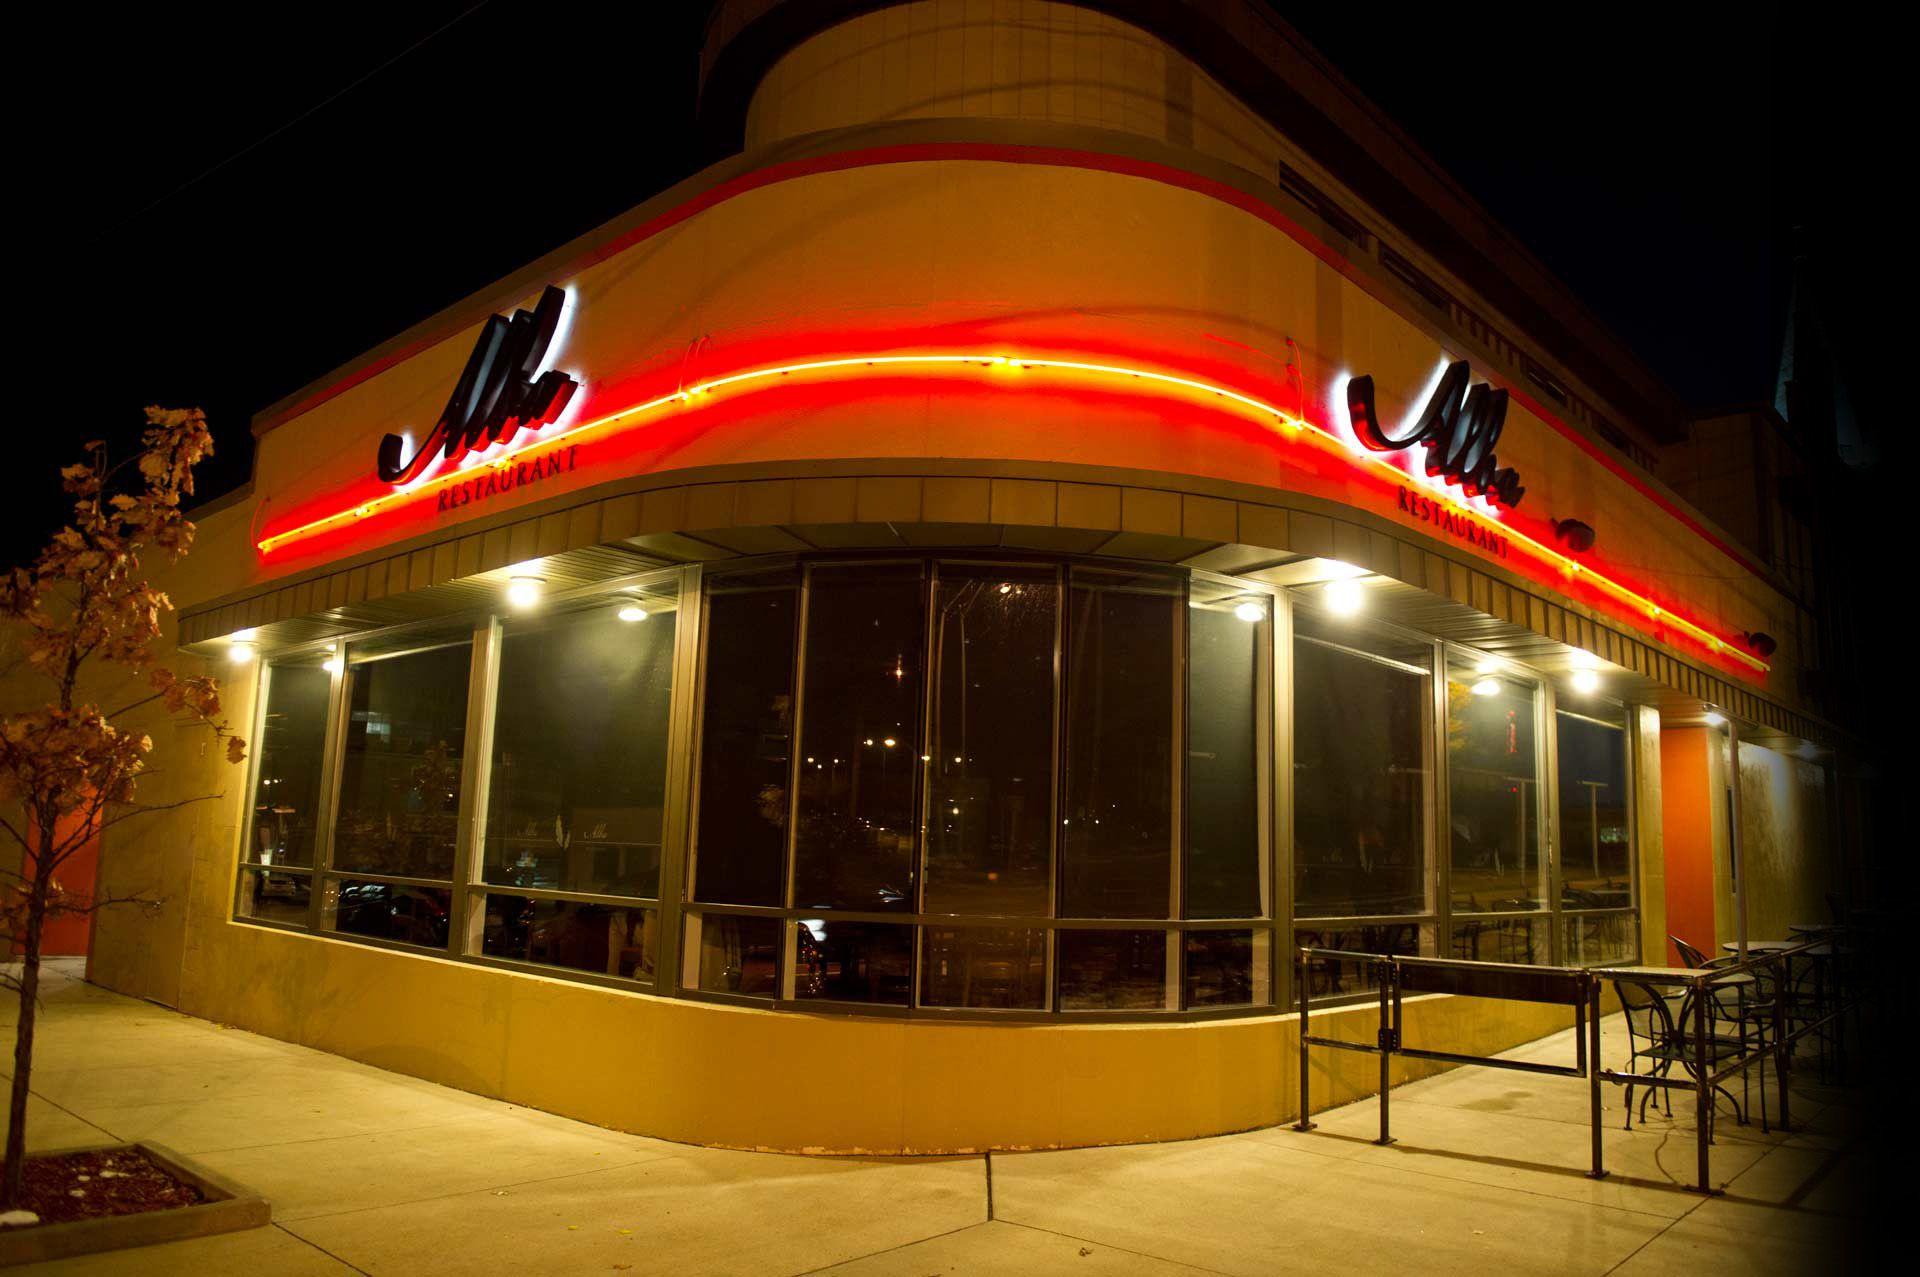 Alba Restaurant Contemporary American Cuisine In Des Moines East Village Iowa